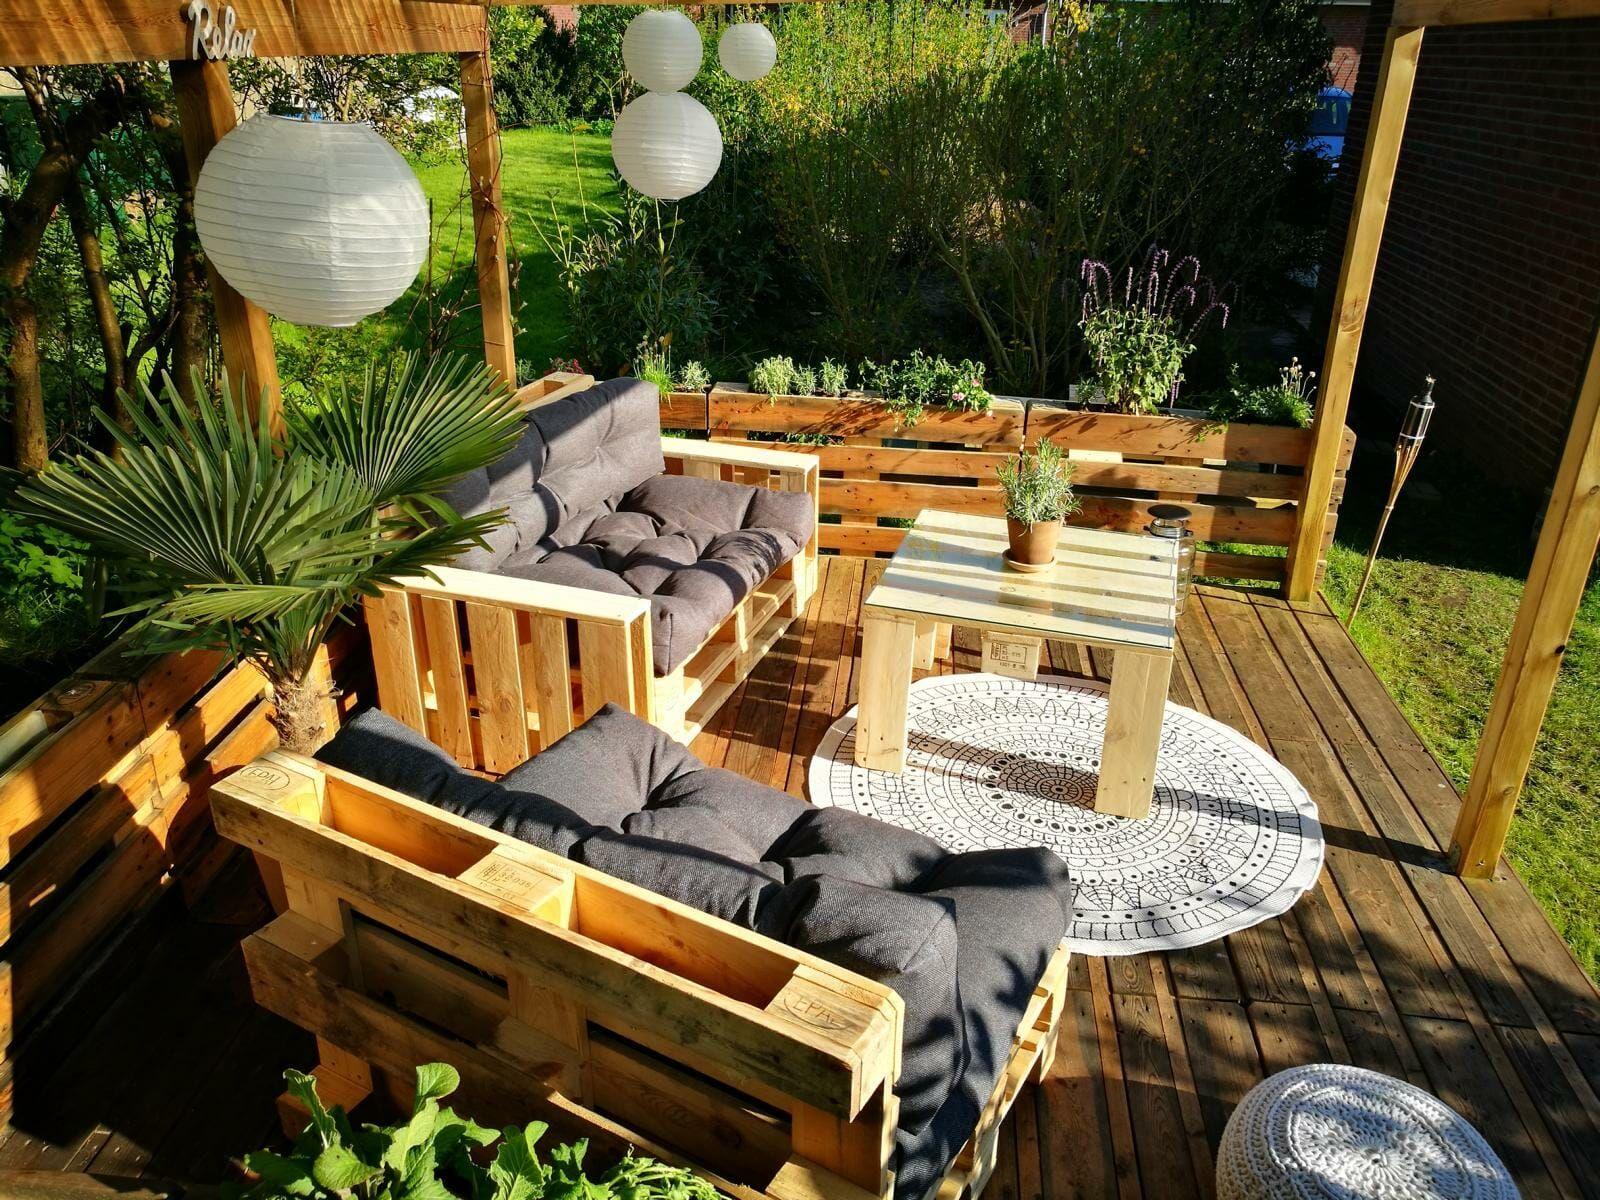 Palettenmöbel Terrasse Paletten Selber Bauenᐅ Terrasse Aus Paletten Selber Bauen Palettenm Terrace Furniture Outdoor Furniture Sets Diy Pallet Furniture